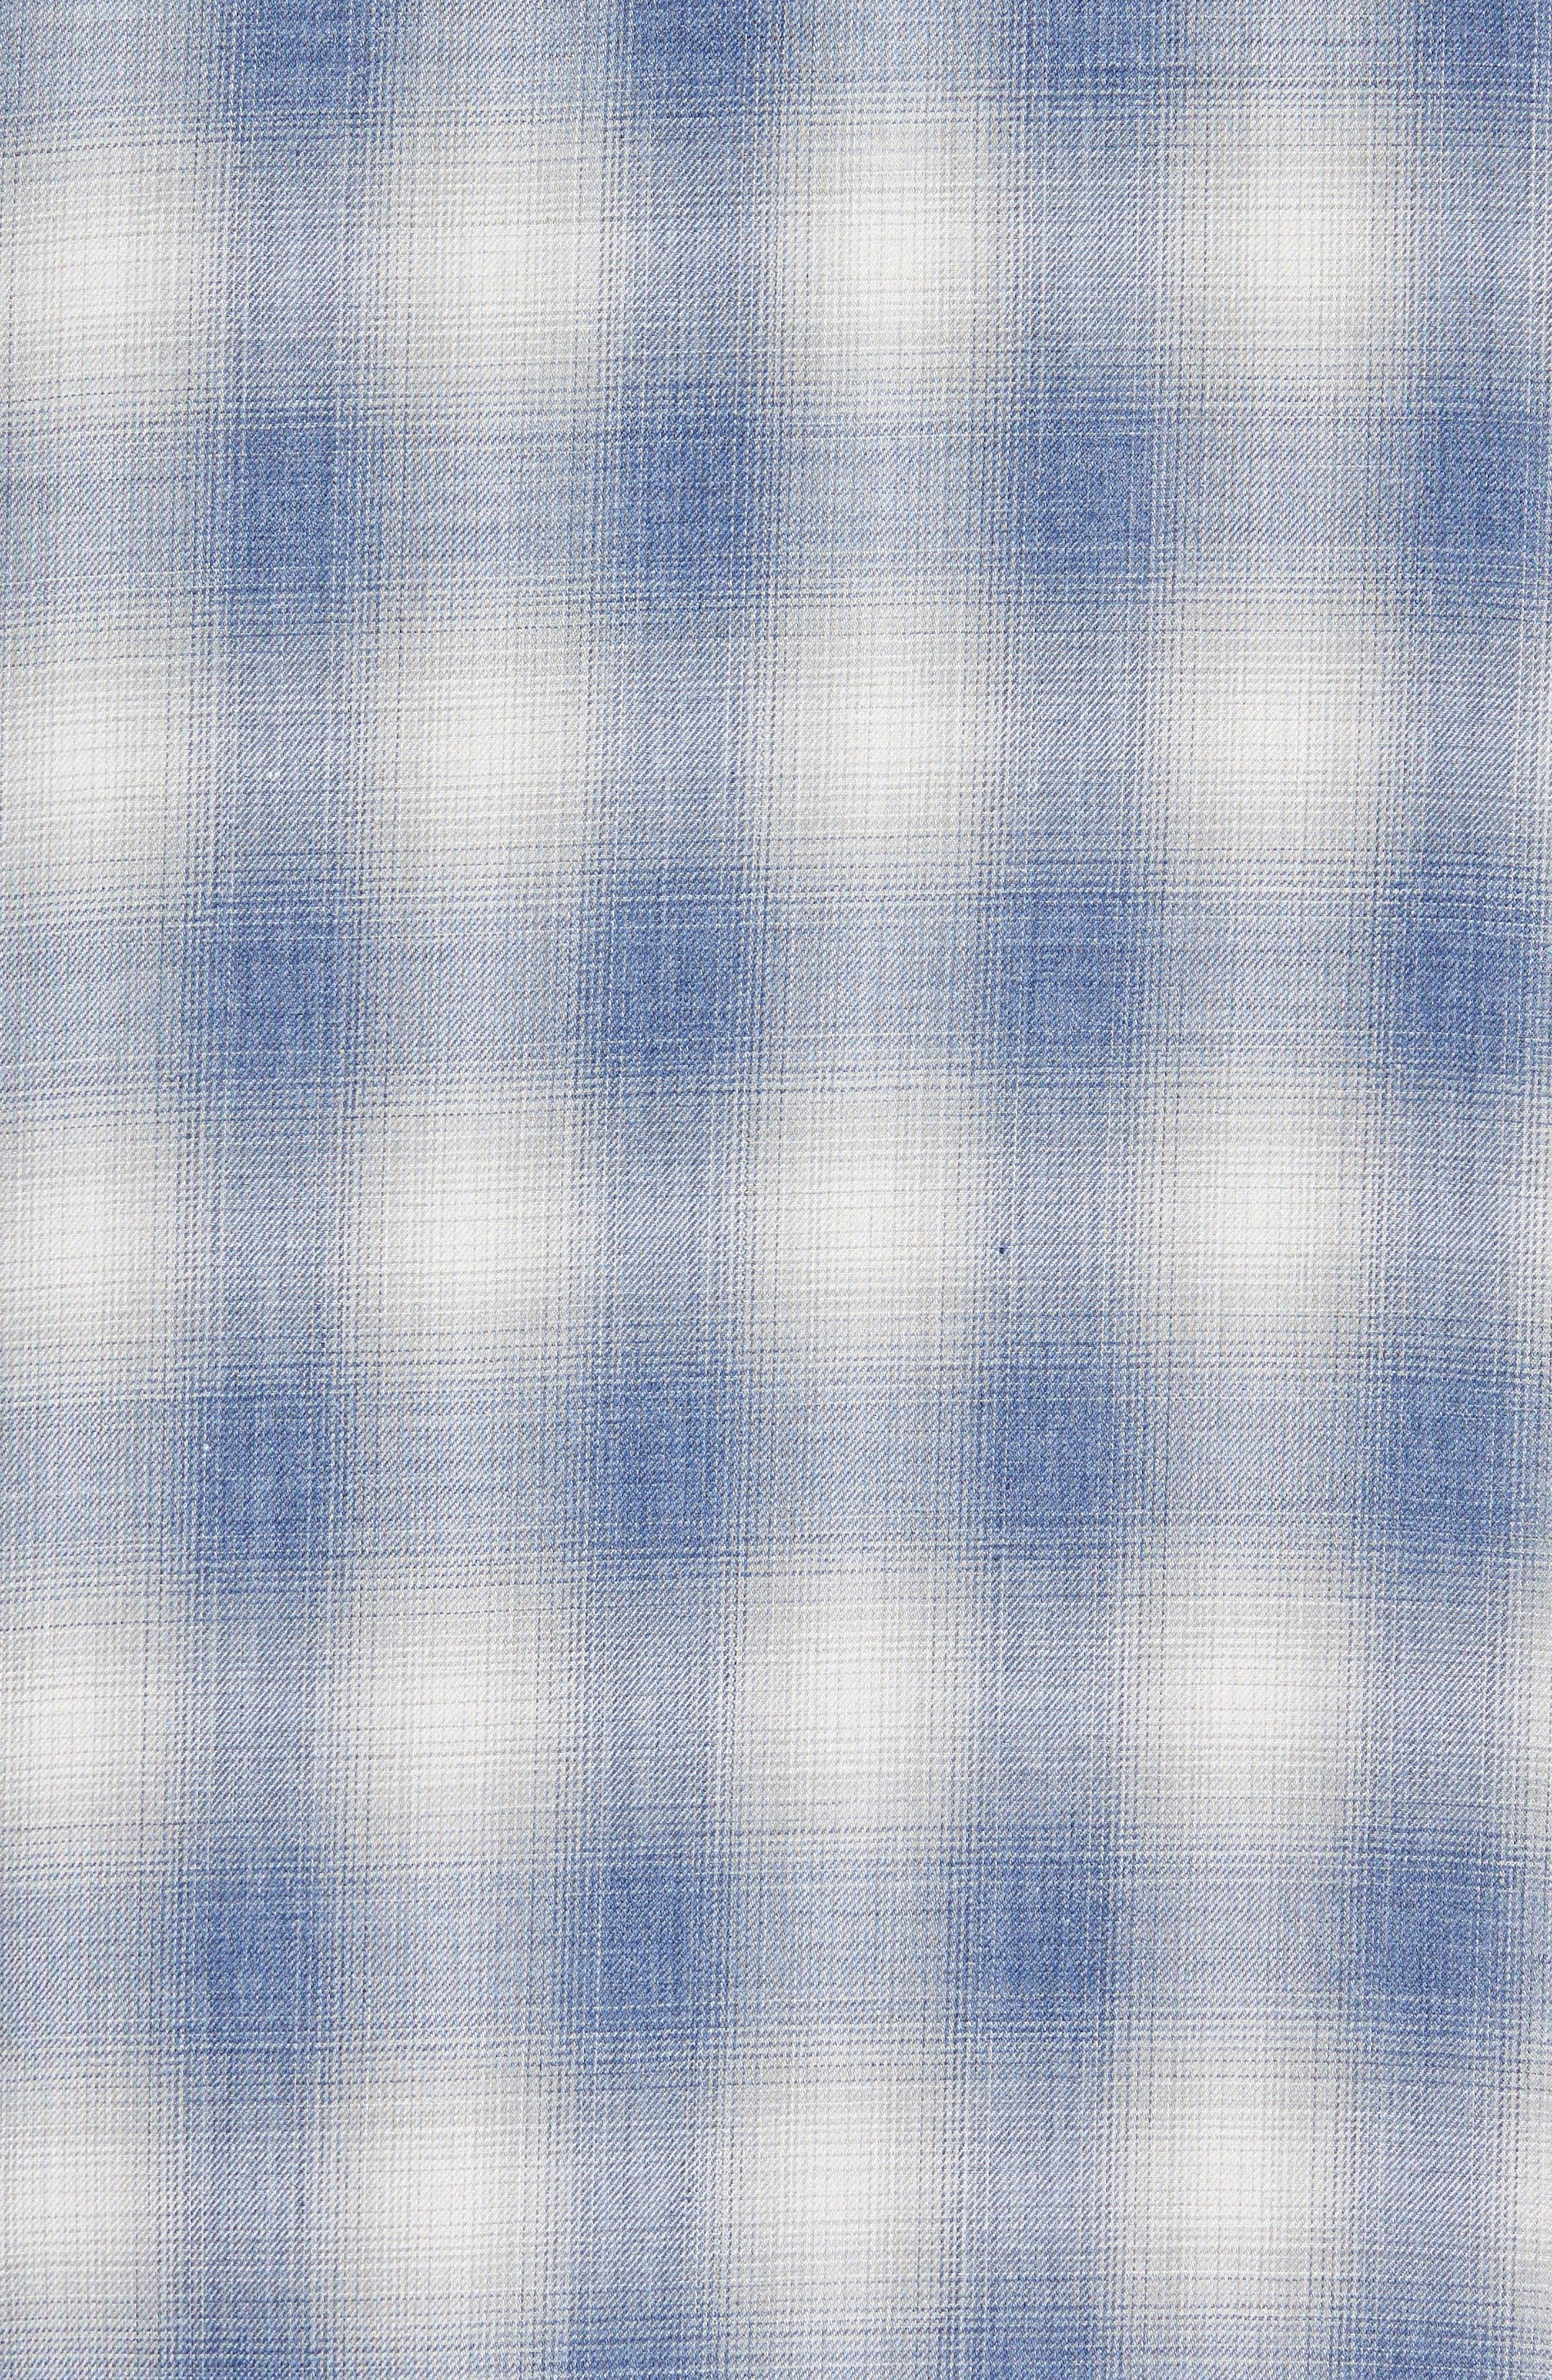 Shadow Slim Fit Plaid Sport Shirt,                             Alternate thumbnail 5, color,                             Spruce Blue